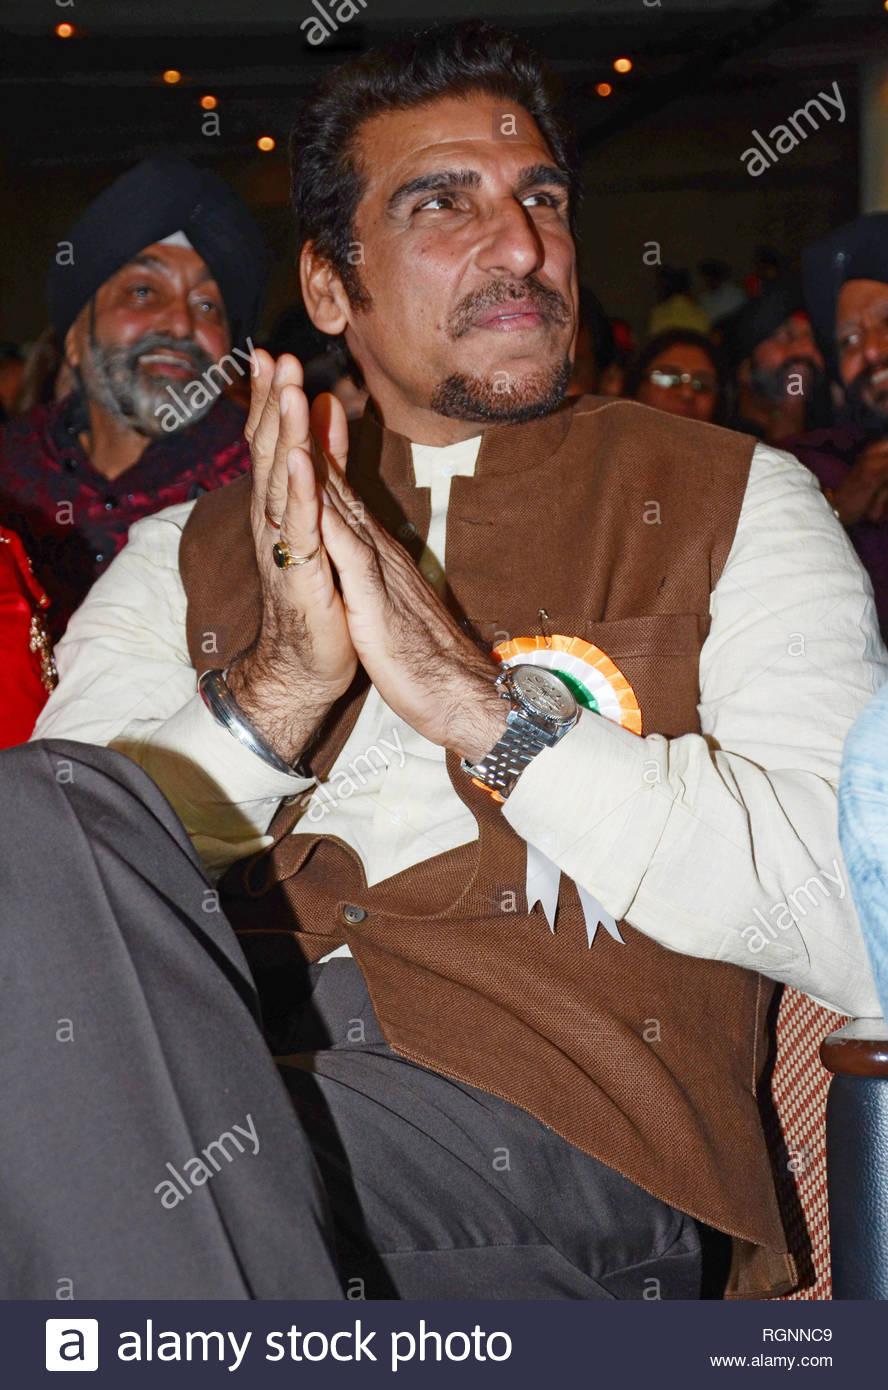 Bollywood actor Mukesh Rishi during an event organized by Punjabi association, on the occasion of Baisakhi festival in Mumbai, India on April 13, 2013. (Shripad Naik) - Stock Image